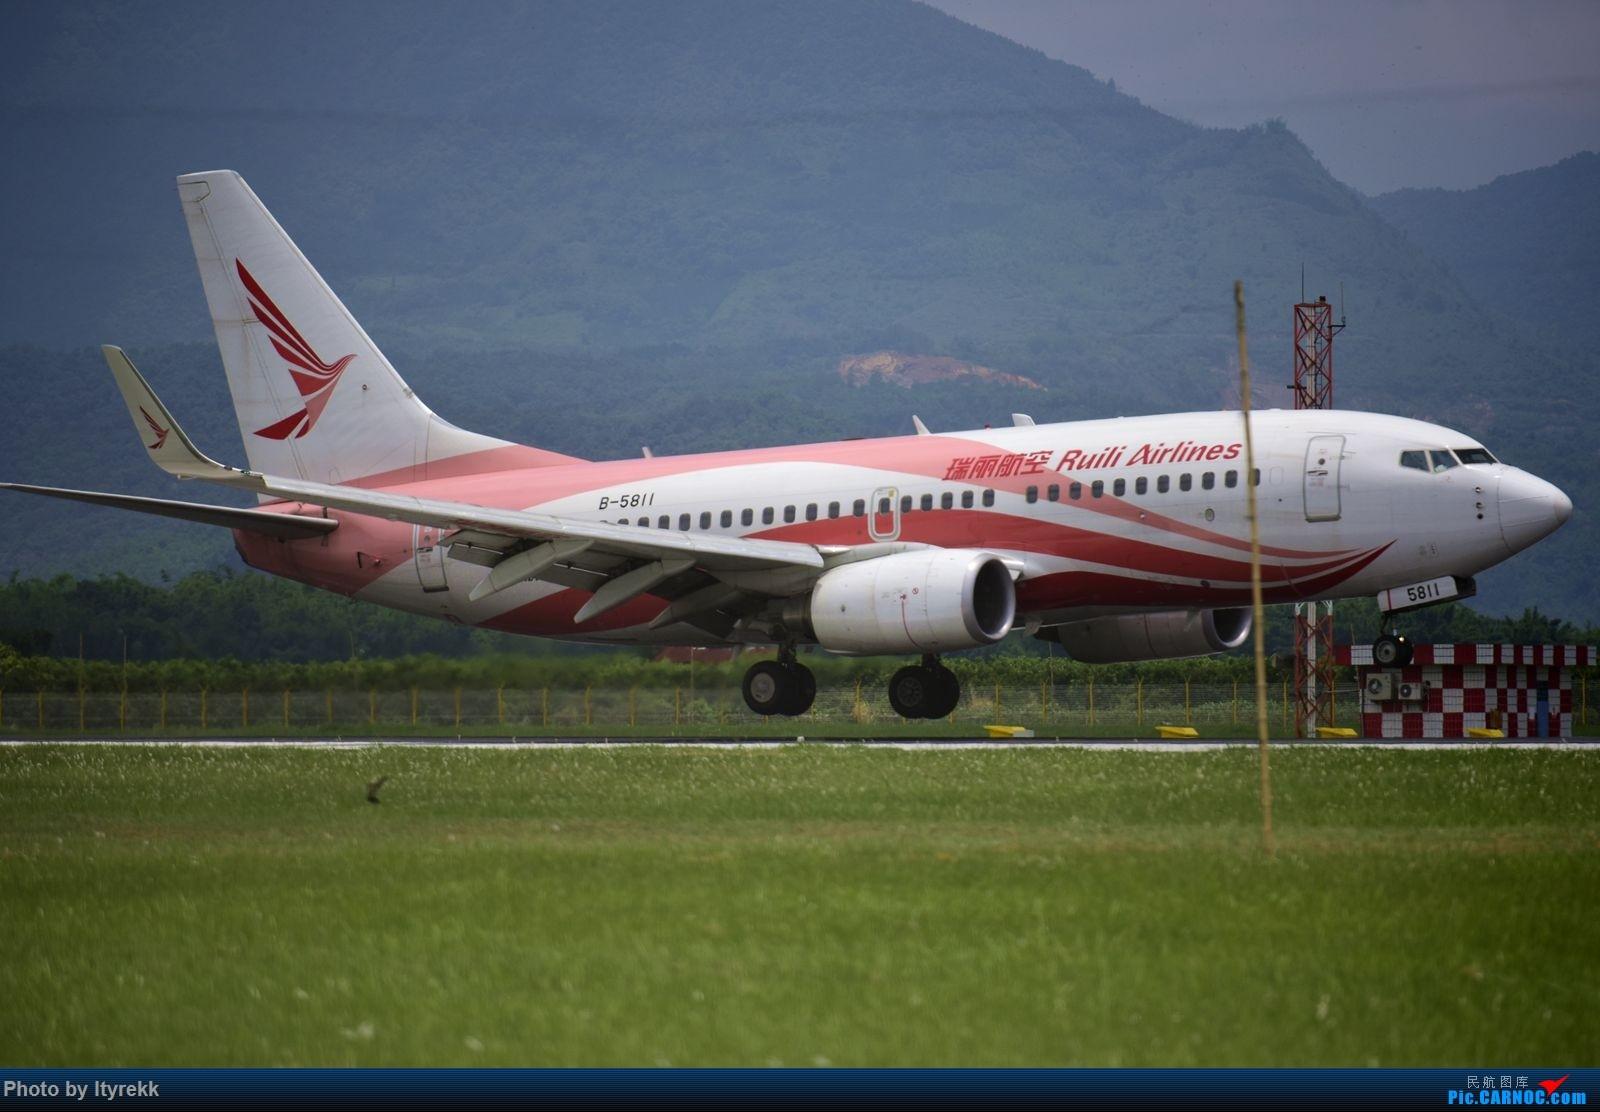 Re:[原创]怀念暑假时飞友们在一起拍机的日子 BOEING 737-700 B-5811 中国芒市机场